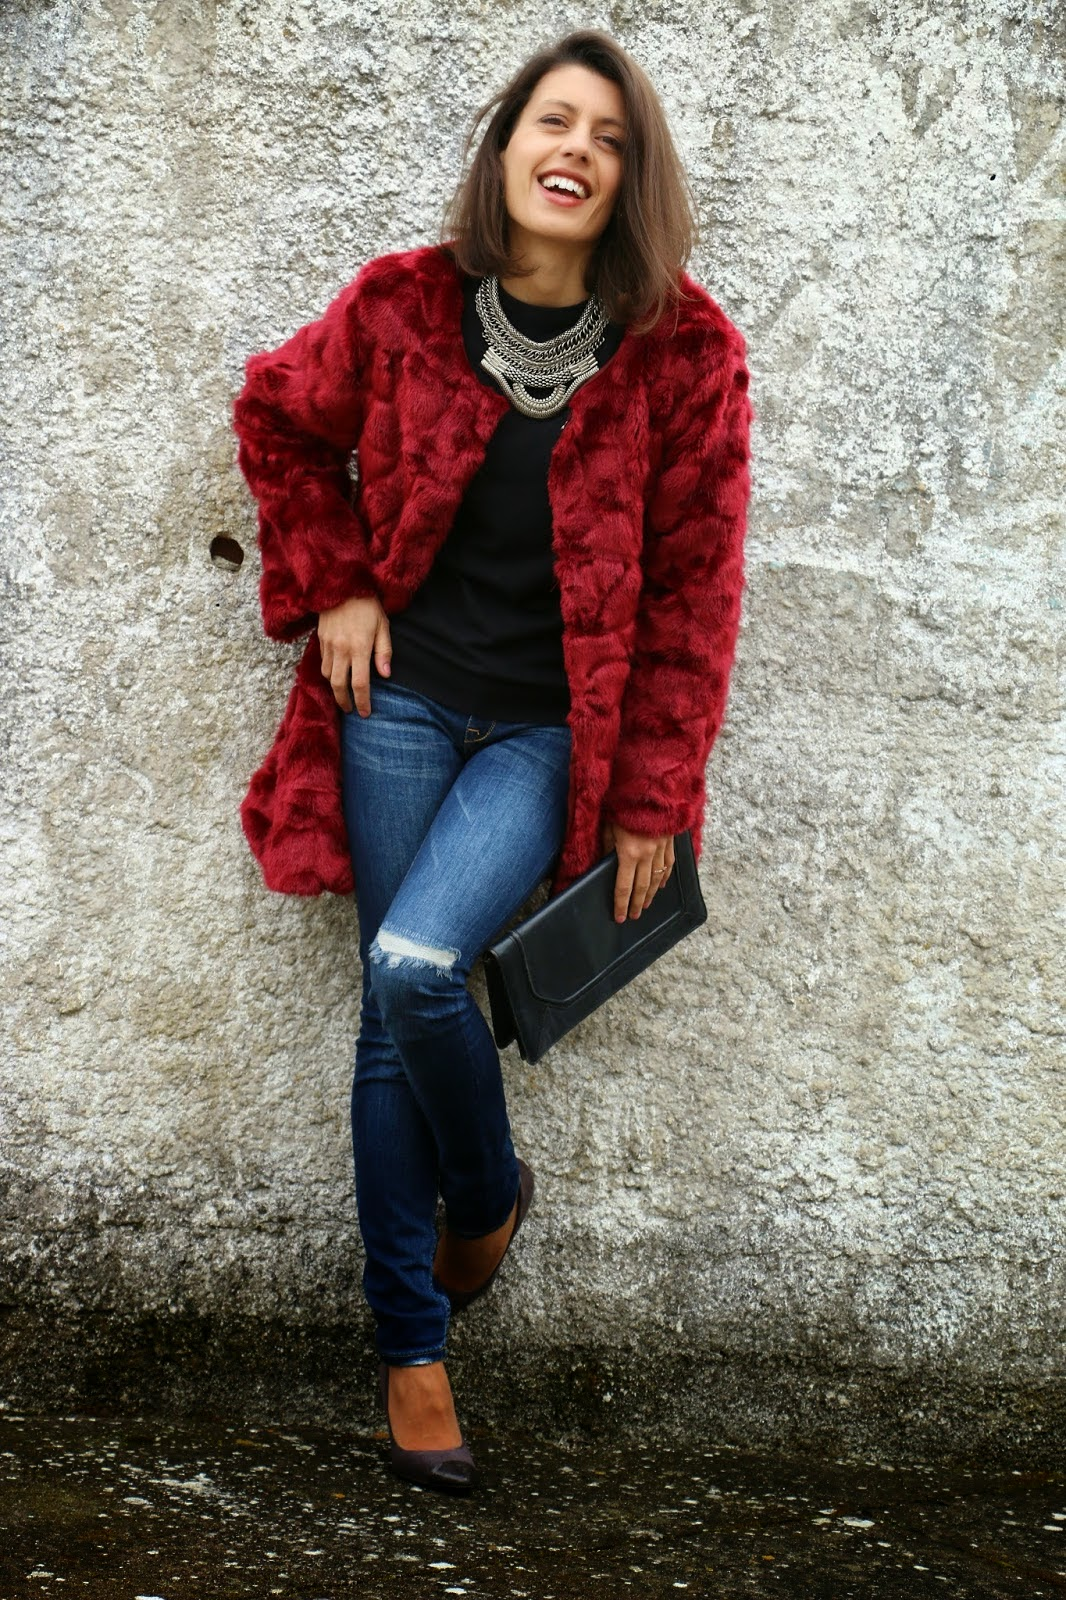 http://ilovefitametrica.blogspot.pt/2015/03/burgundy-fur-coat.html